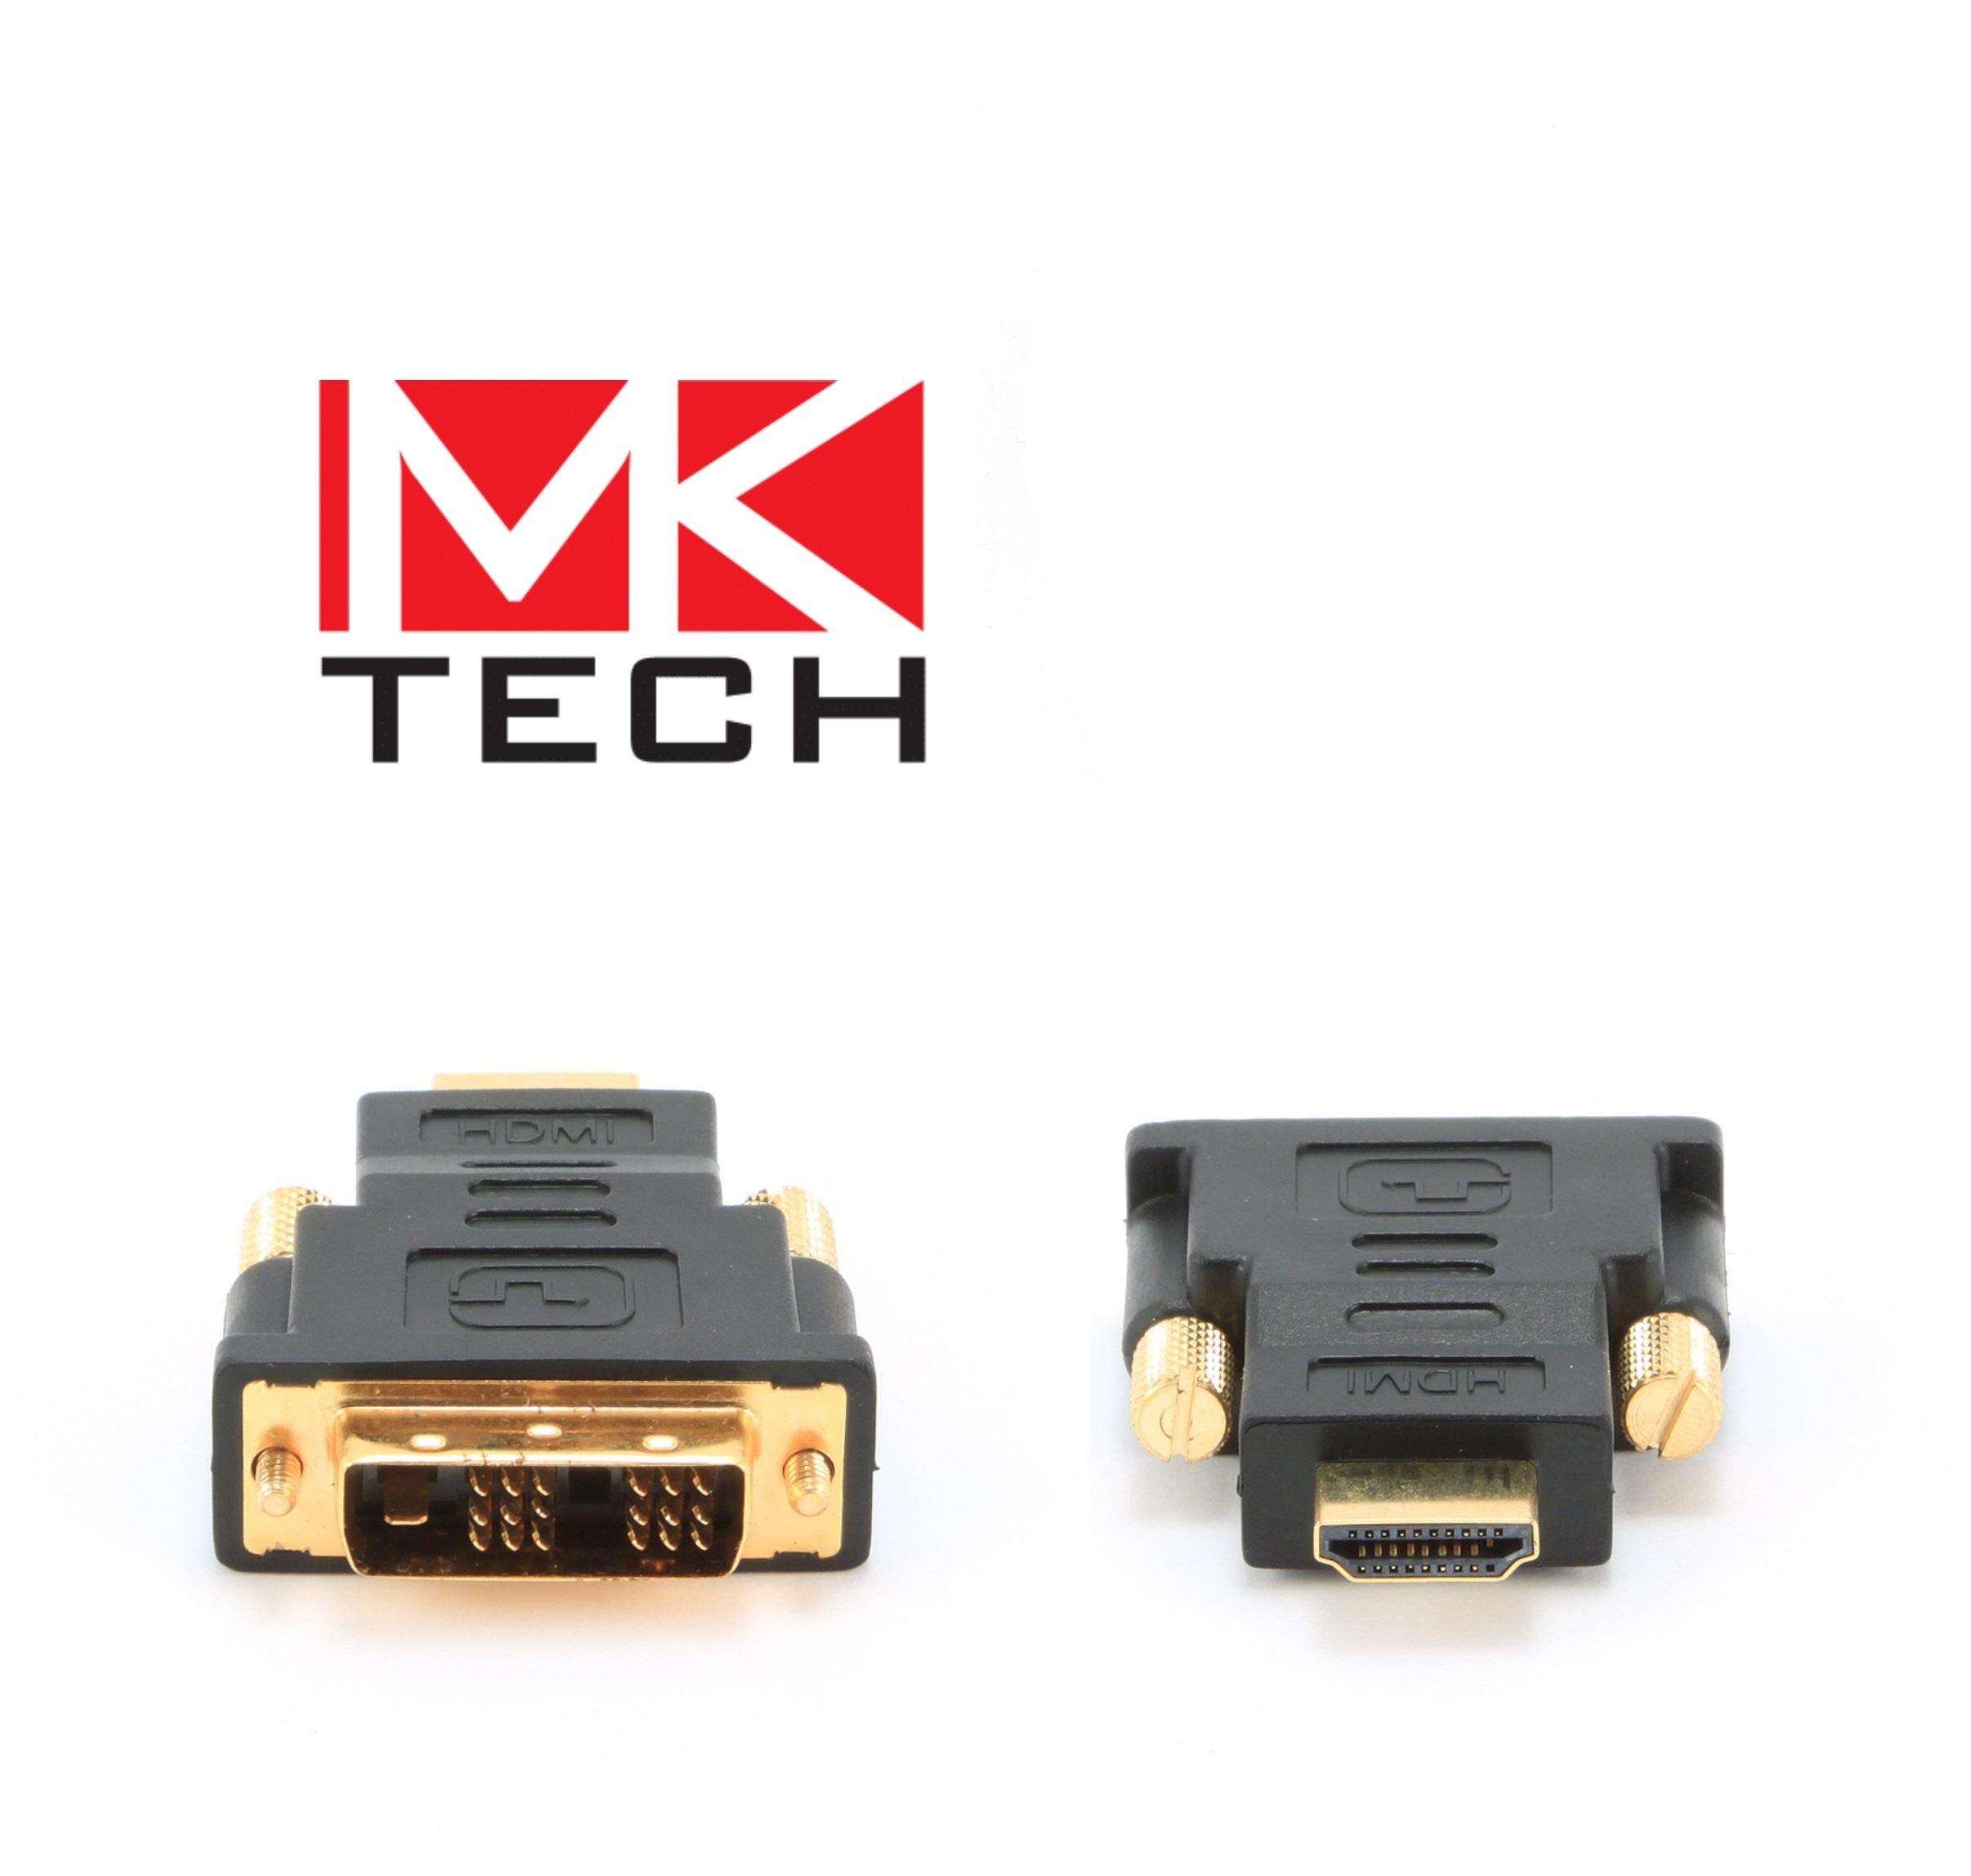 HDMI to DVI male MKTECH